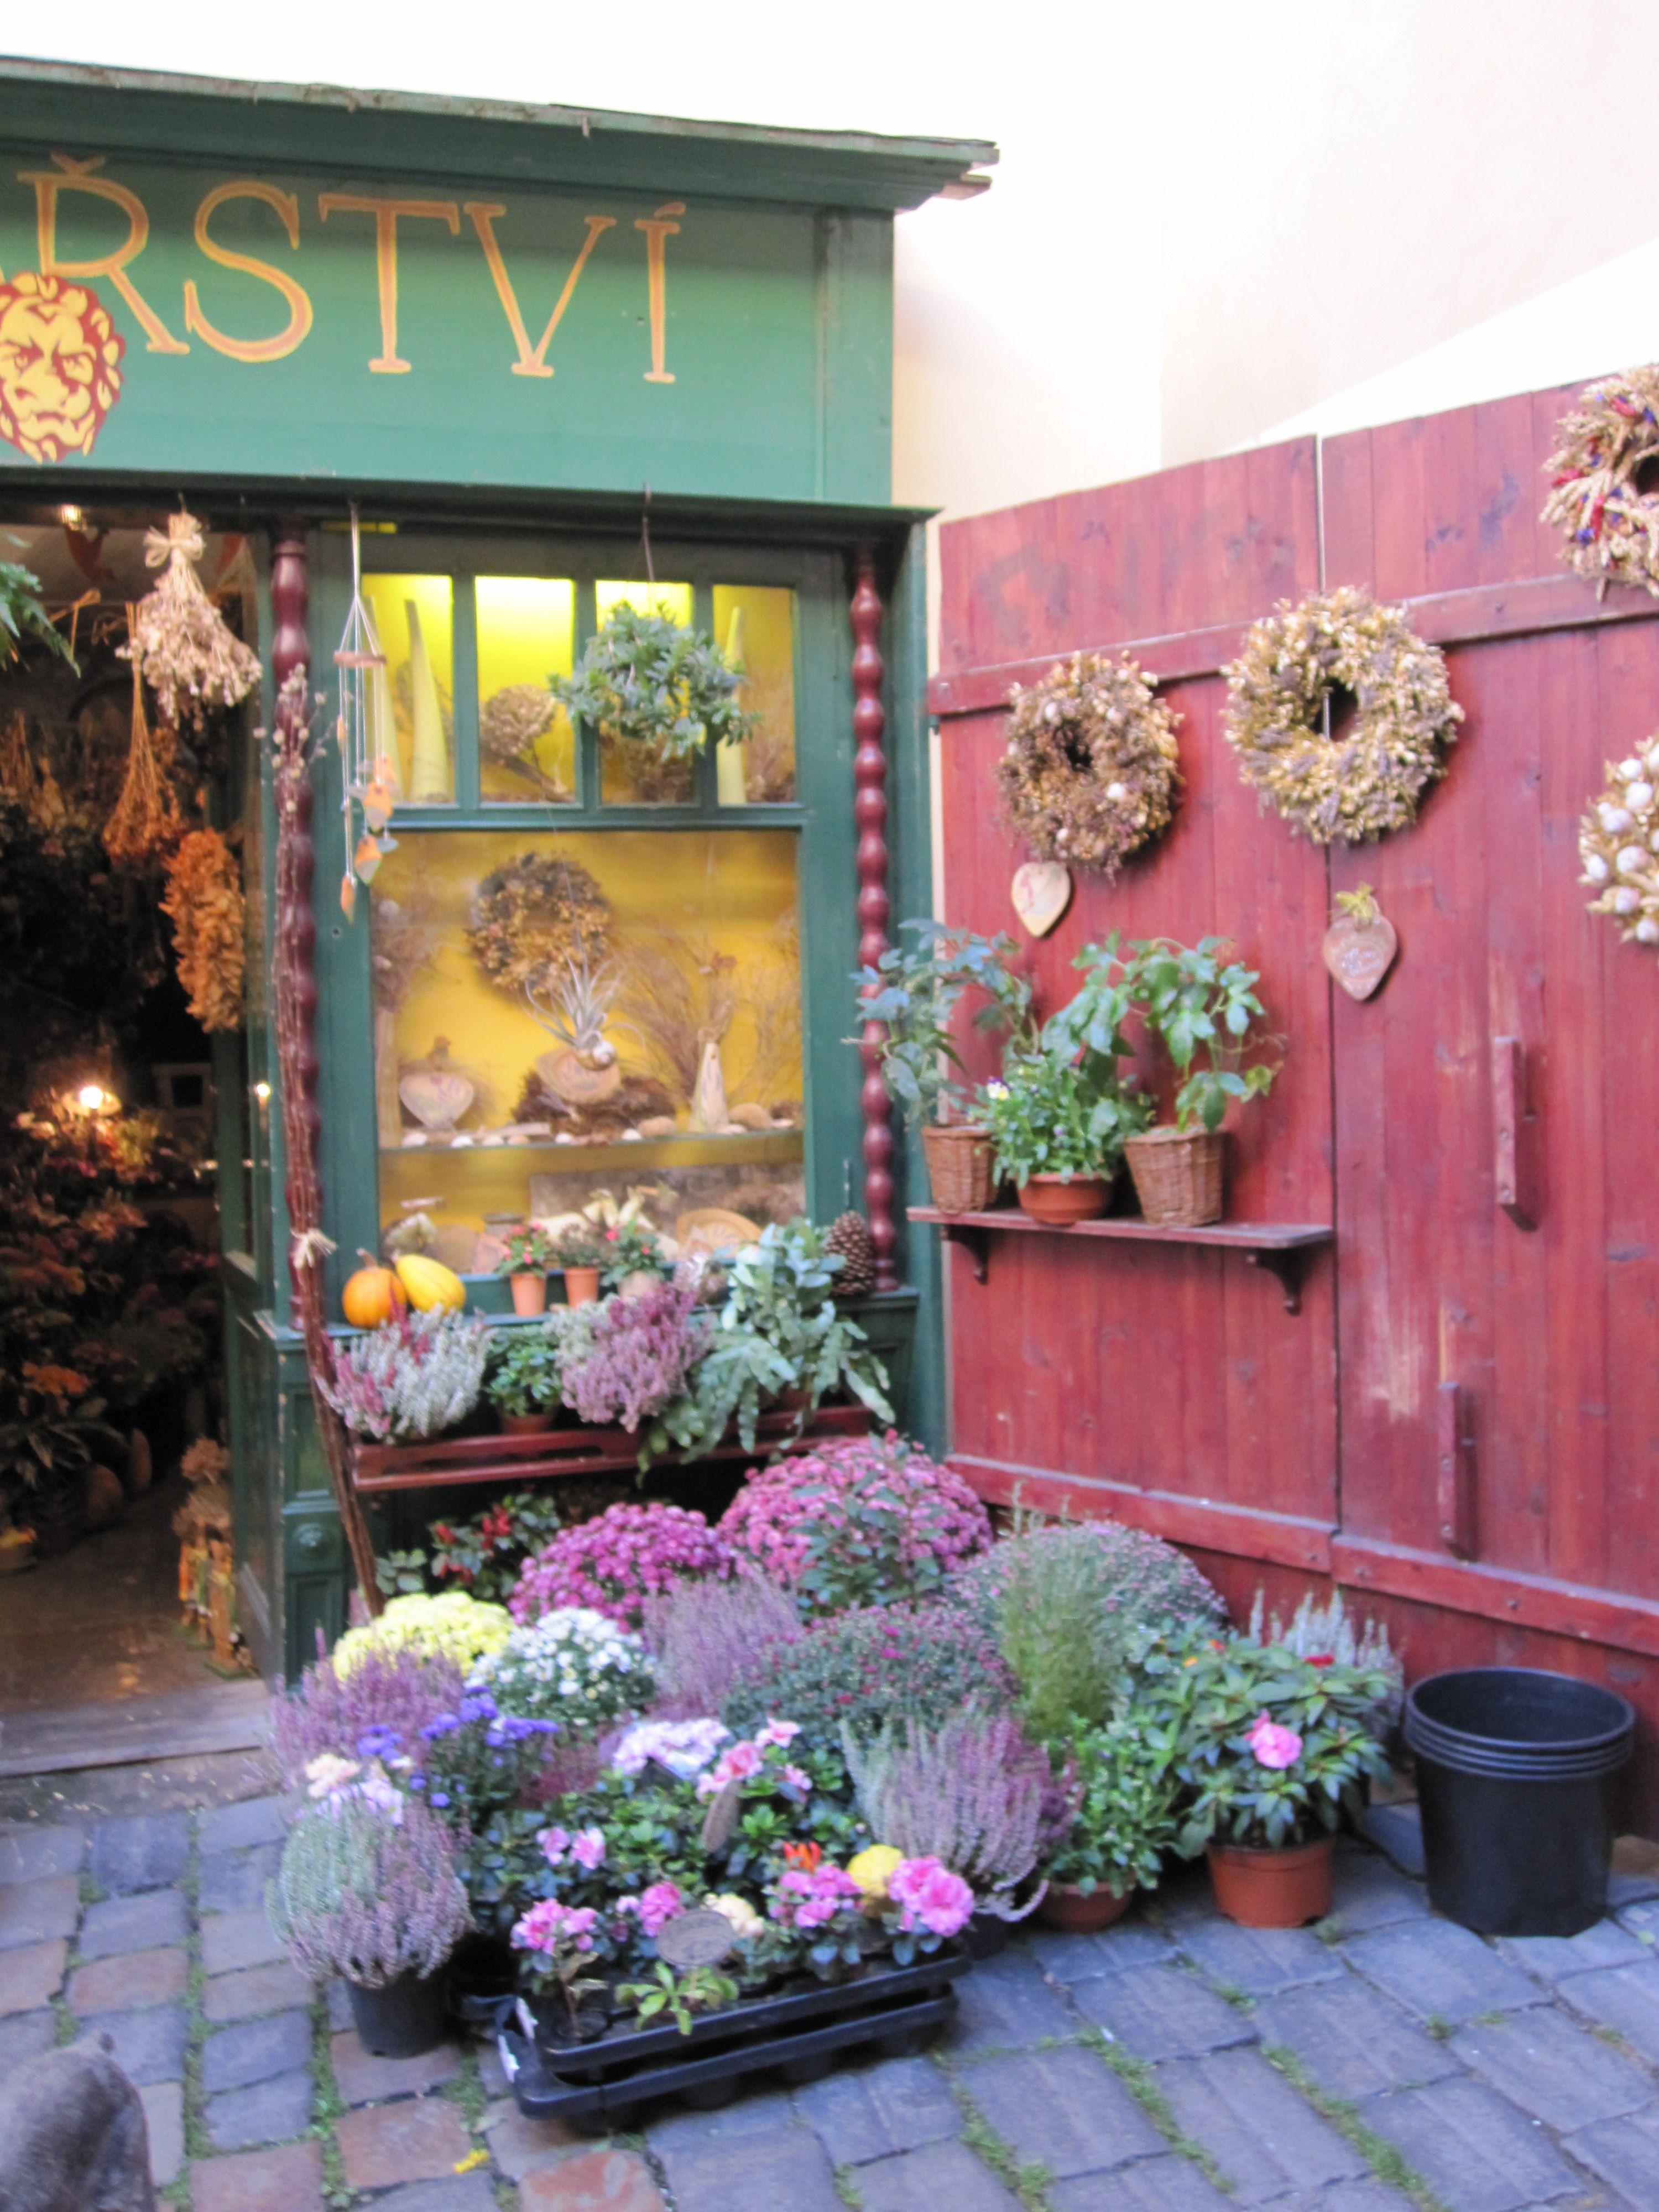 Lovely flower shop in prague been lucky enough to visit lovely flower shop in prague izmirmasajfo